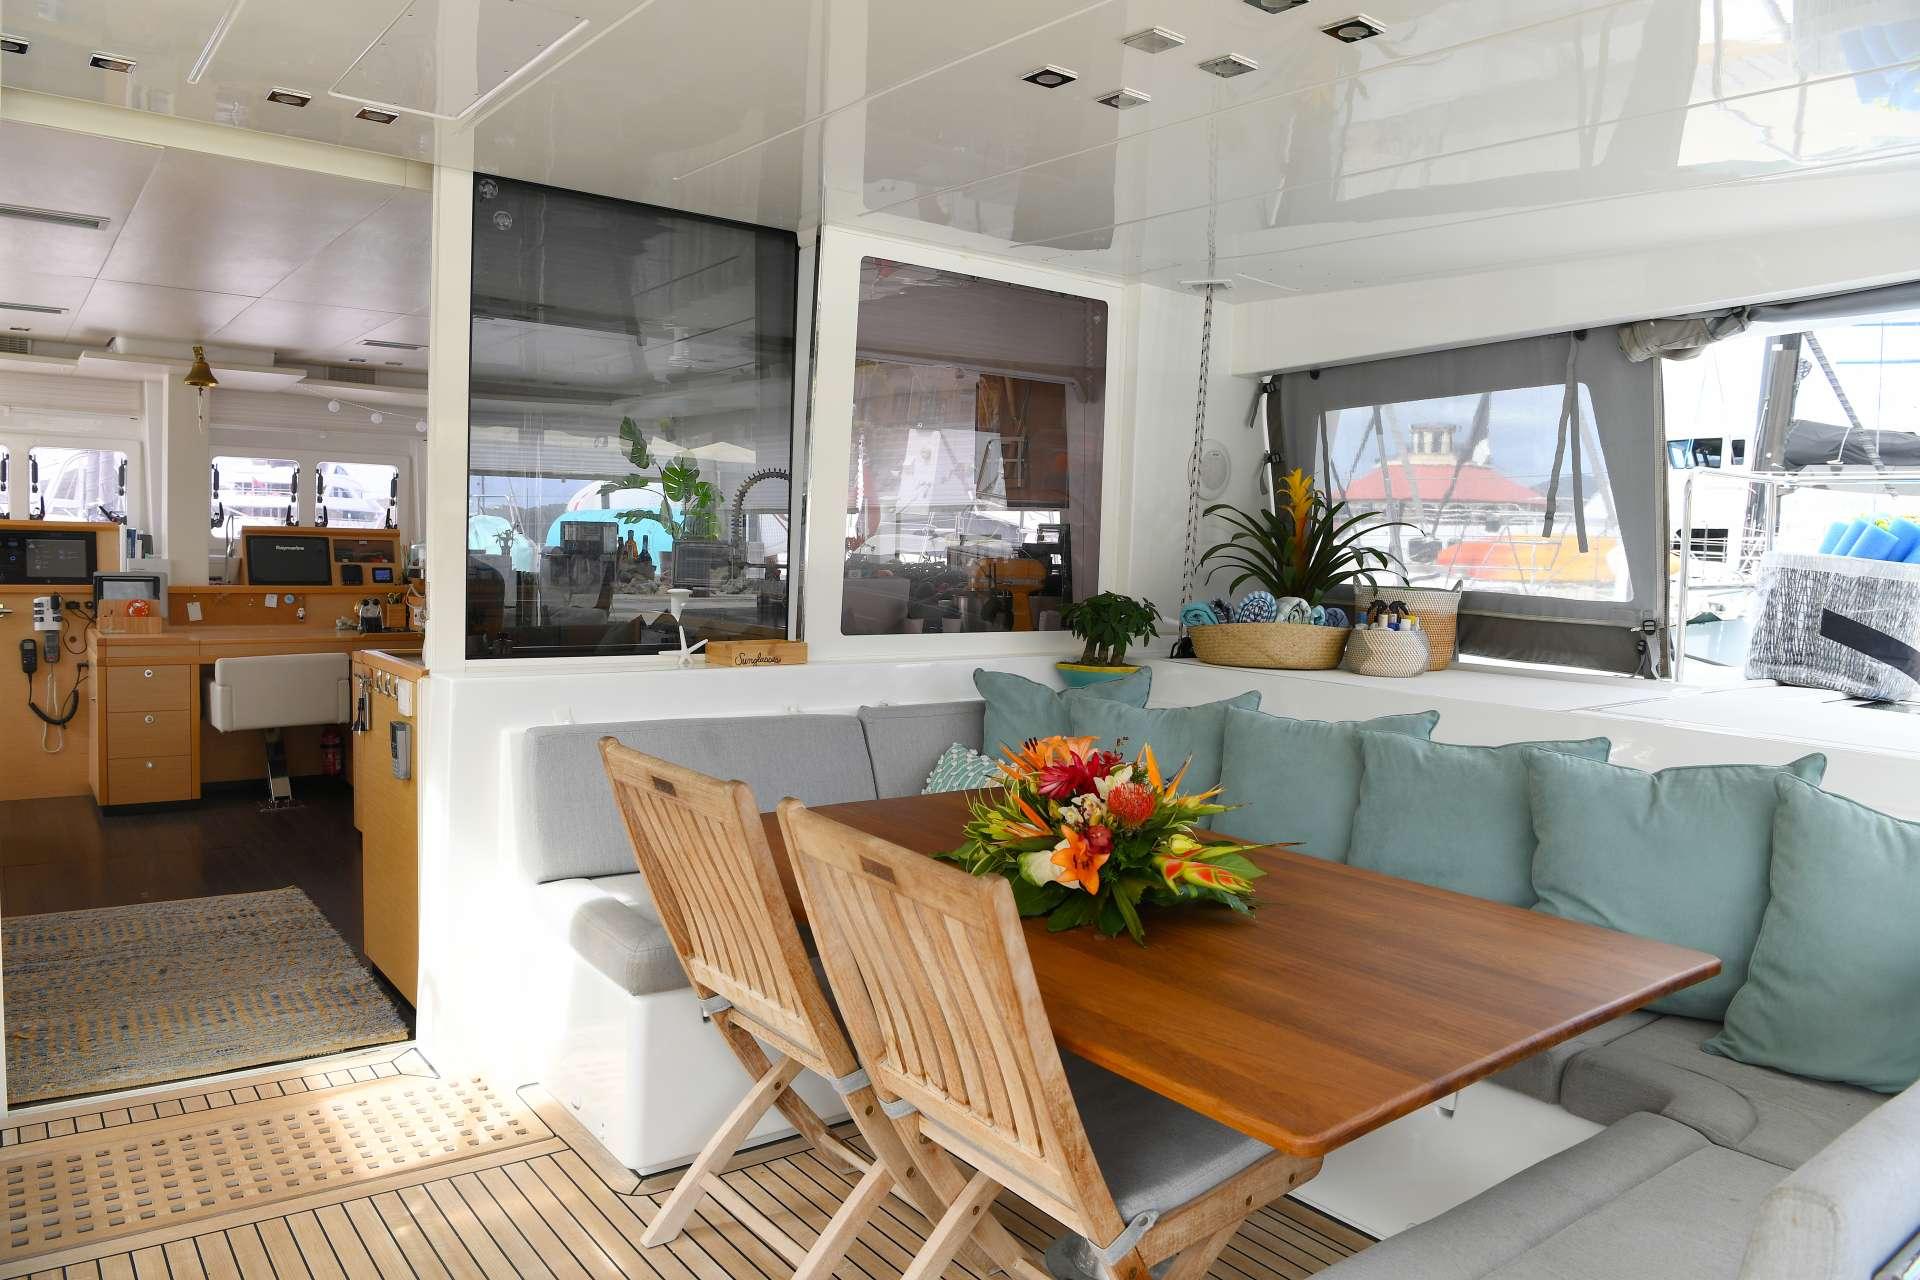 Cat Yacht 'Cat', 8 PAX, 2 Crew, 56.00 Ft, 17.00 Meters, Built 2013, Lagoon, Refit Year 2018